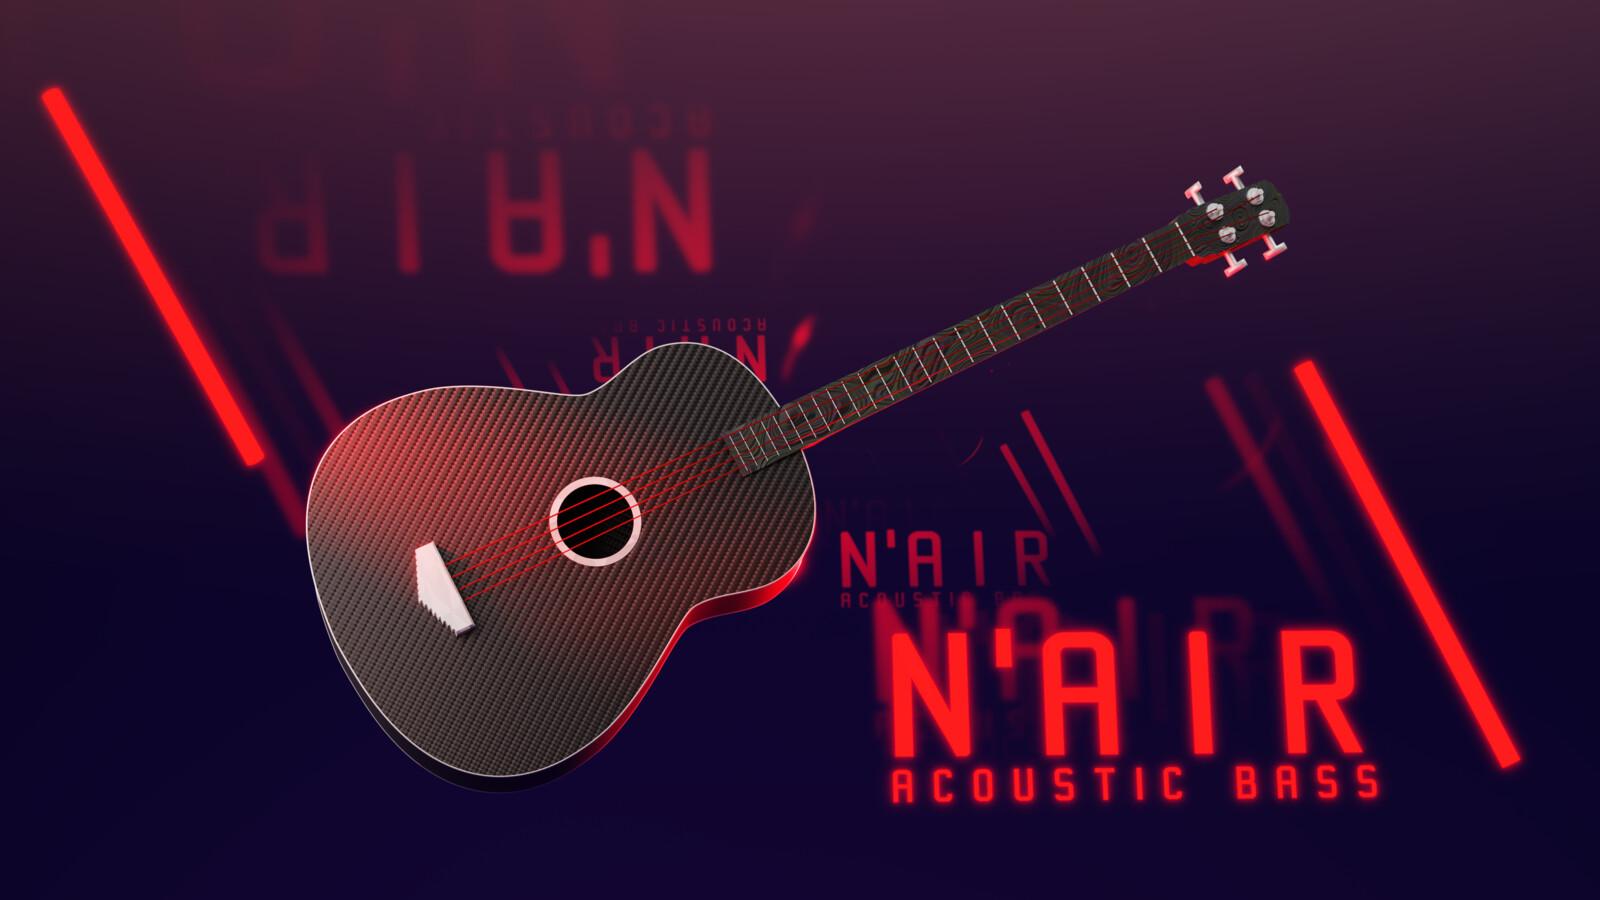 The final product. Full resolution can be found here: https://www.deviantart.com/leowattenberg/art/N-AIR-Acoustic-Bass-843928656